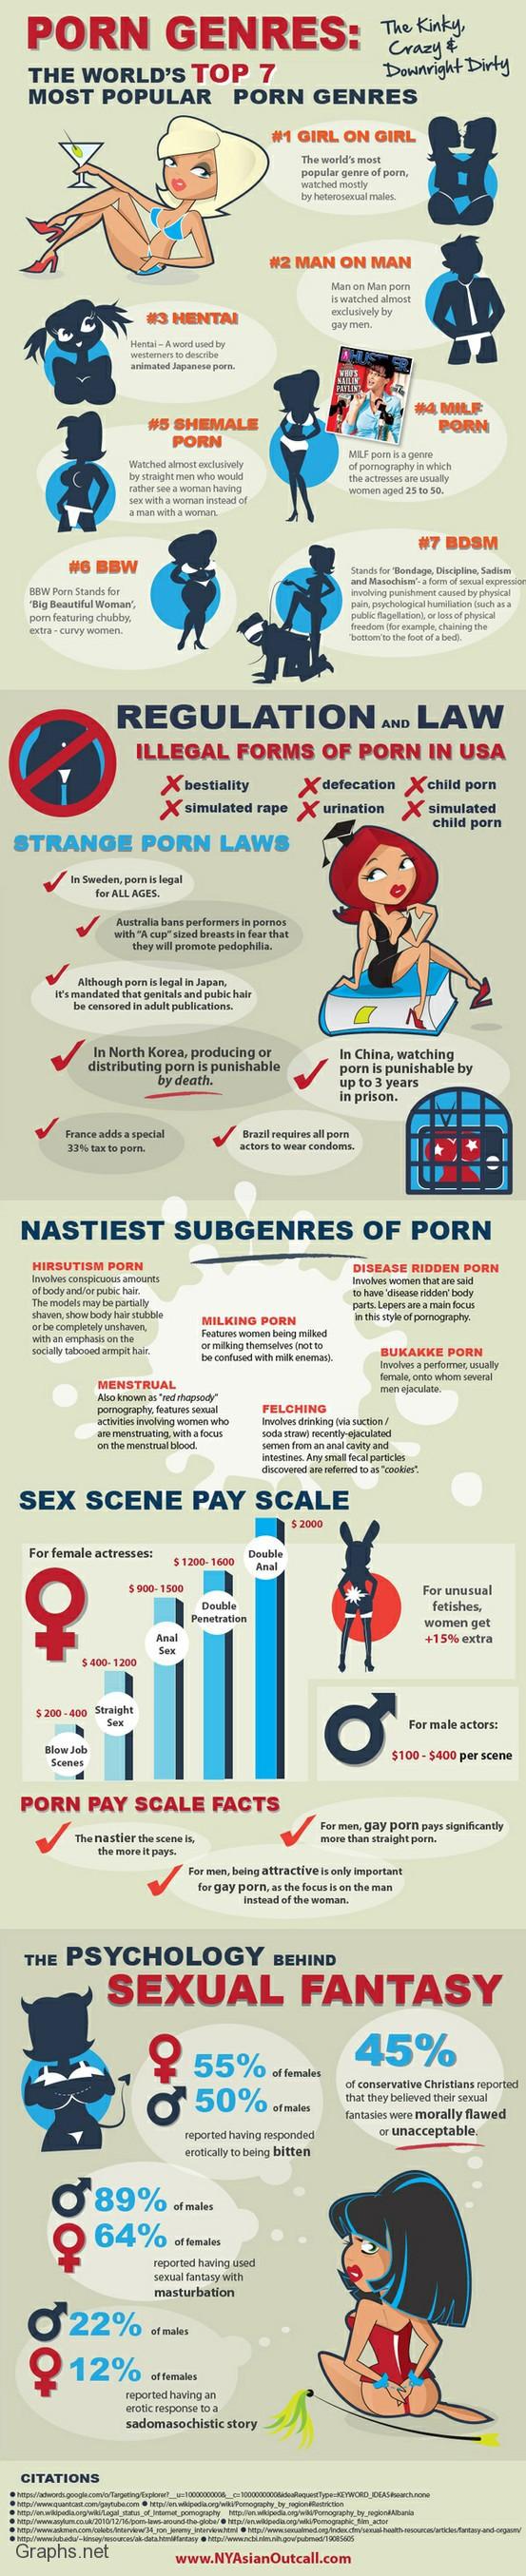 7 Most Popular Porn Genres